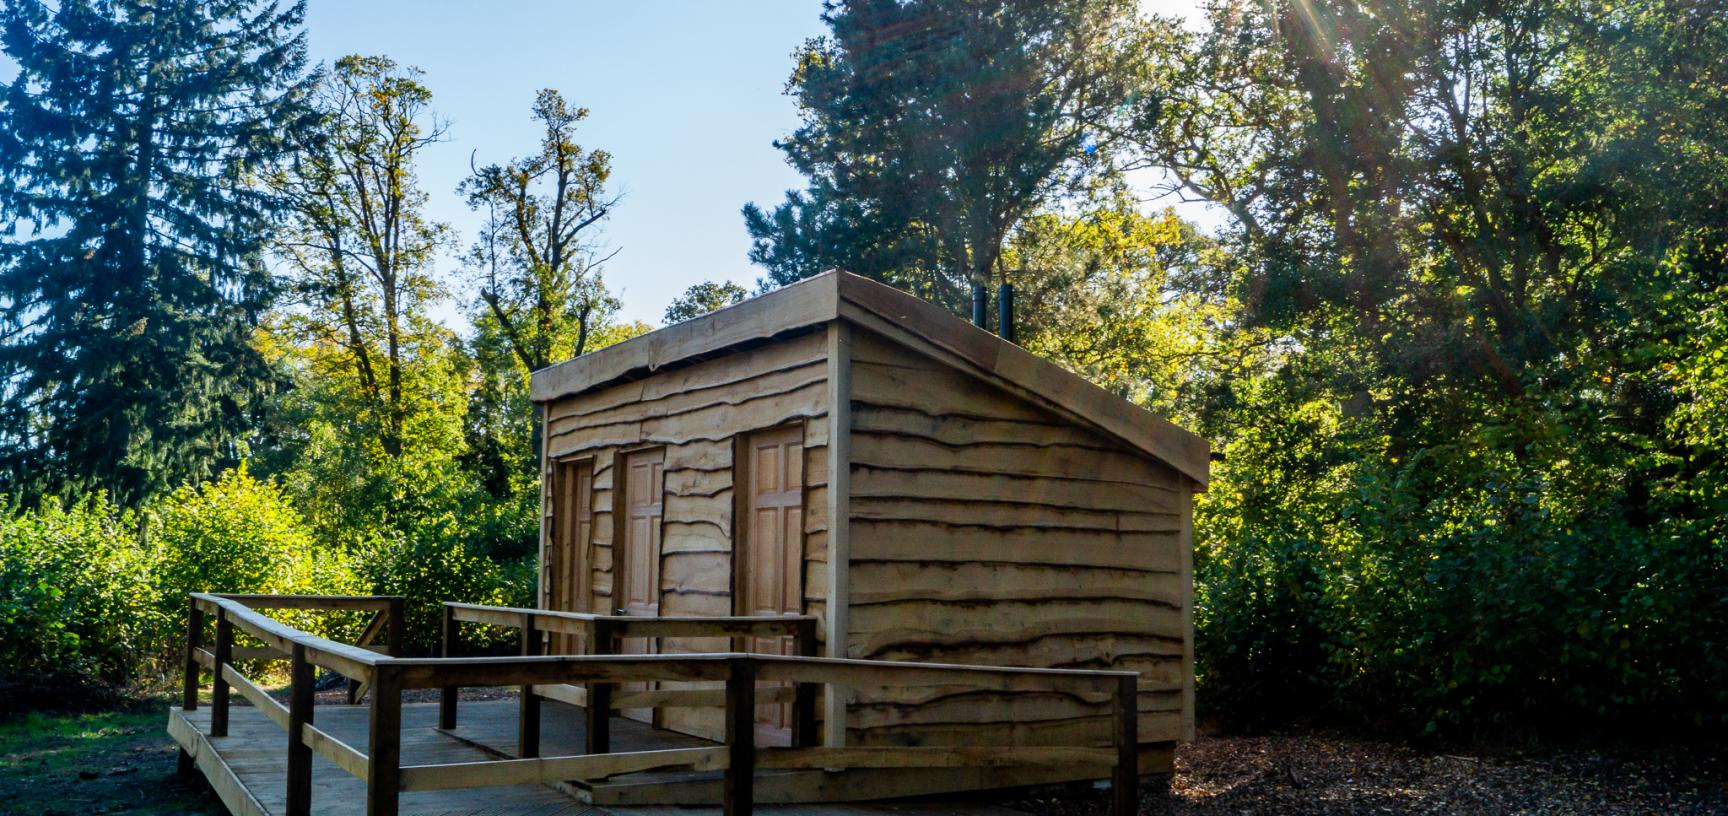 composting toilets arboretum 2 dsc7290